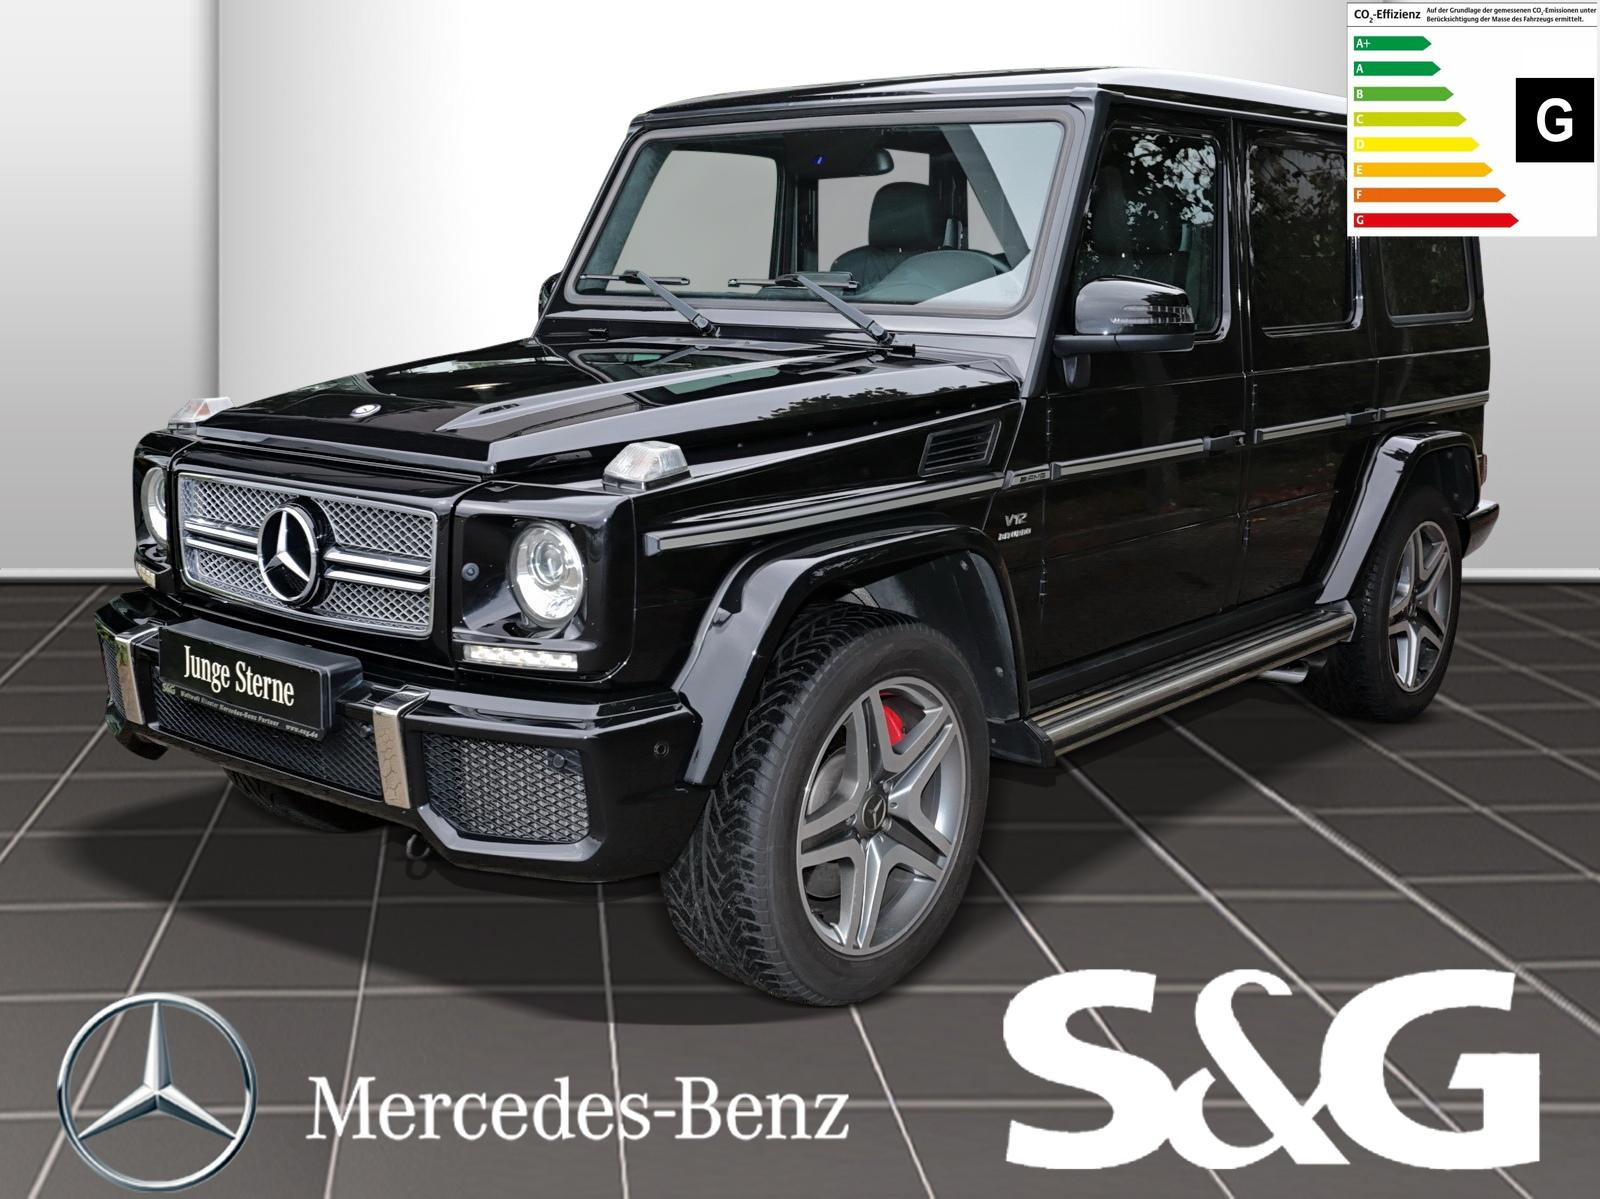 Mercedes-Benz G 65 AMG COMAND/Harman/RüKa/designo-Exklusiv-Pak, Jahr 2013, Benzin